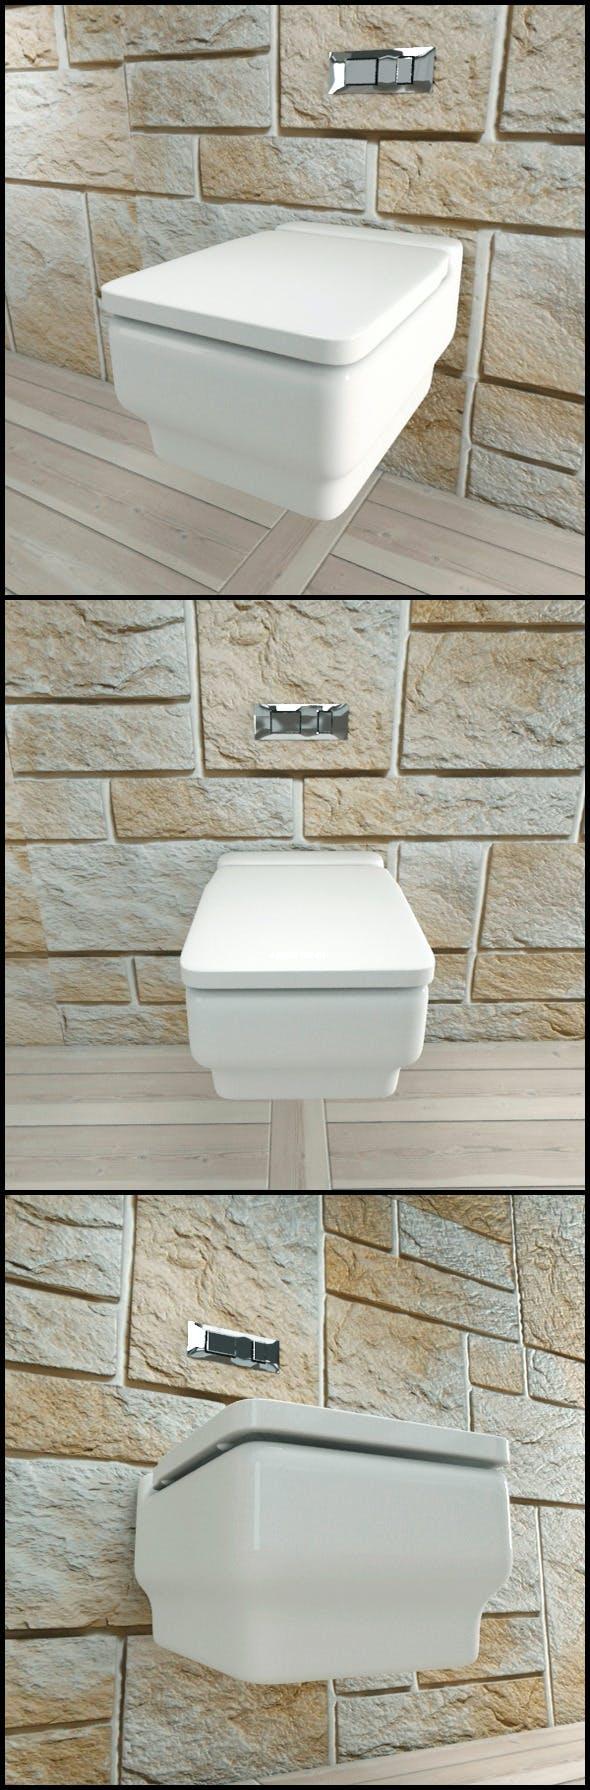 White Ceramic Toilet with Chrome Flush Plate - 3DOcean Item for Sale